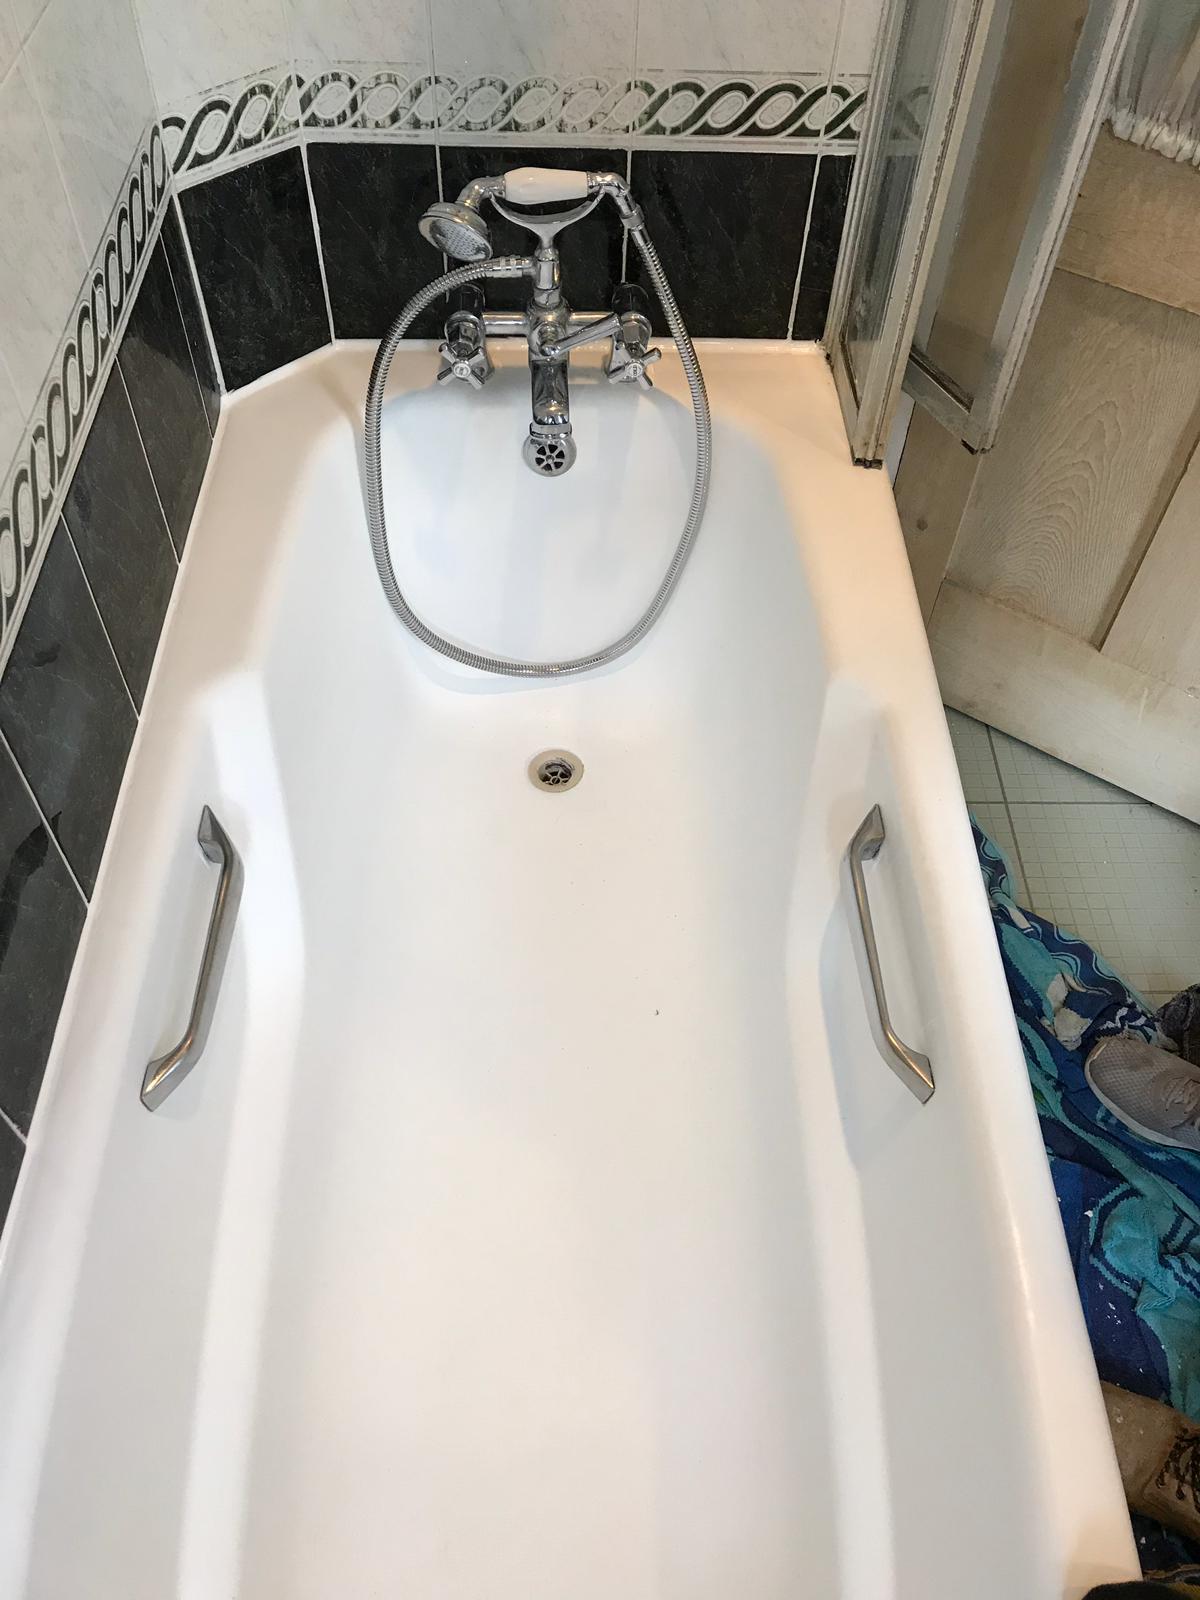 St Albans Bath Tile Grout After Renovation